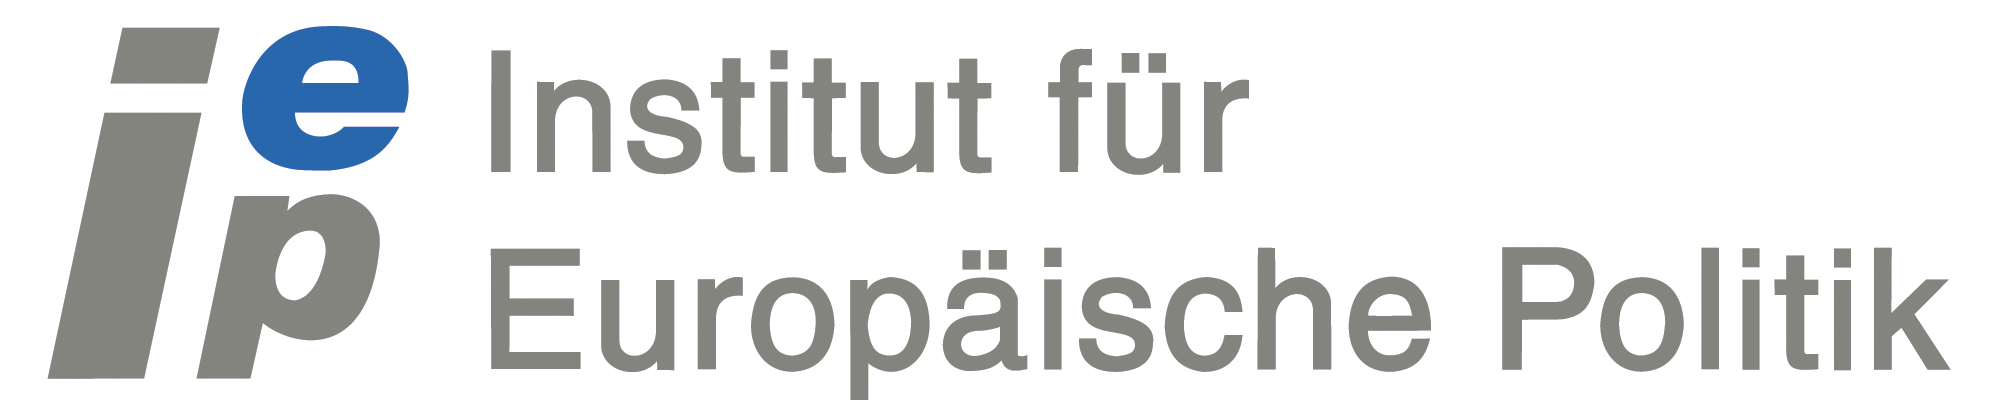 programme german online